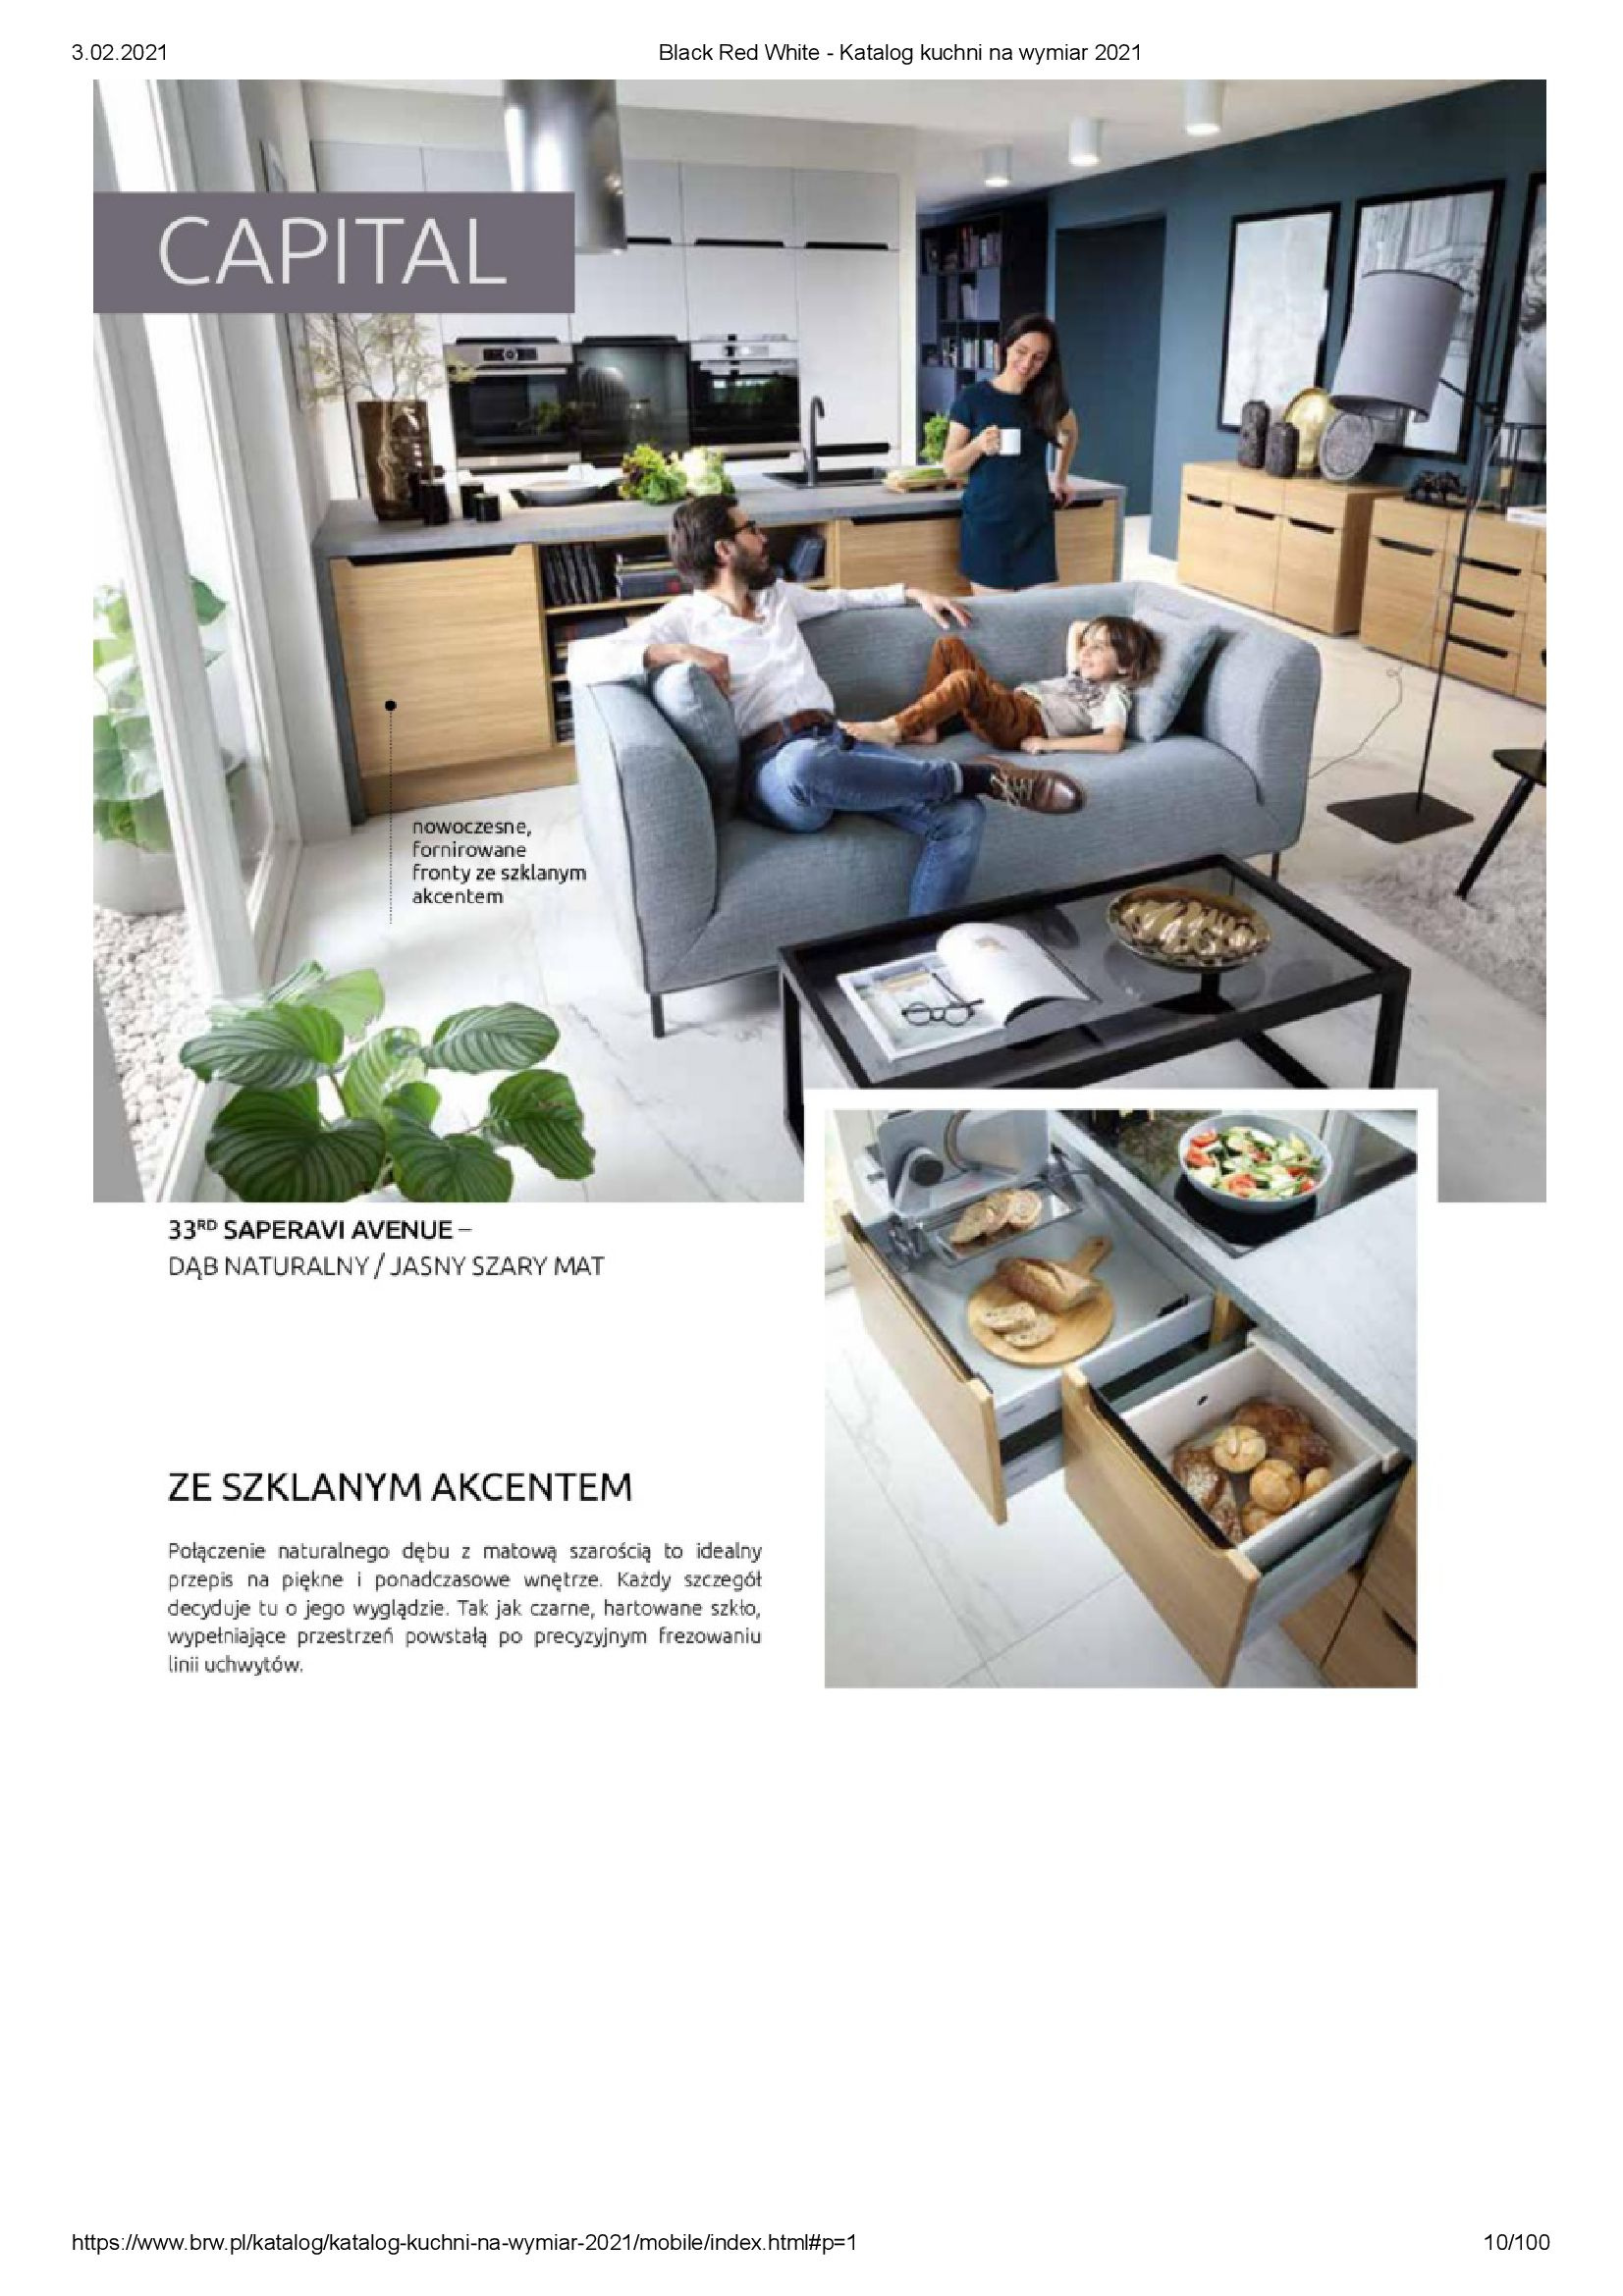 Gazetka Black Red White: Katalog - Kuchnie na wymiar Senso Kitchens 2021 2021-01-01 page-10